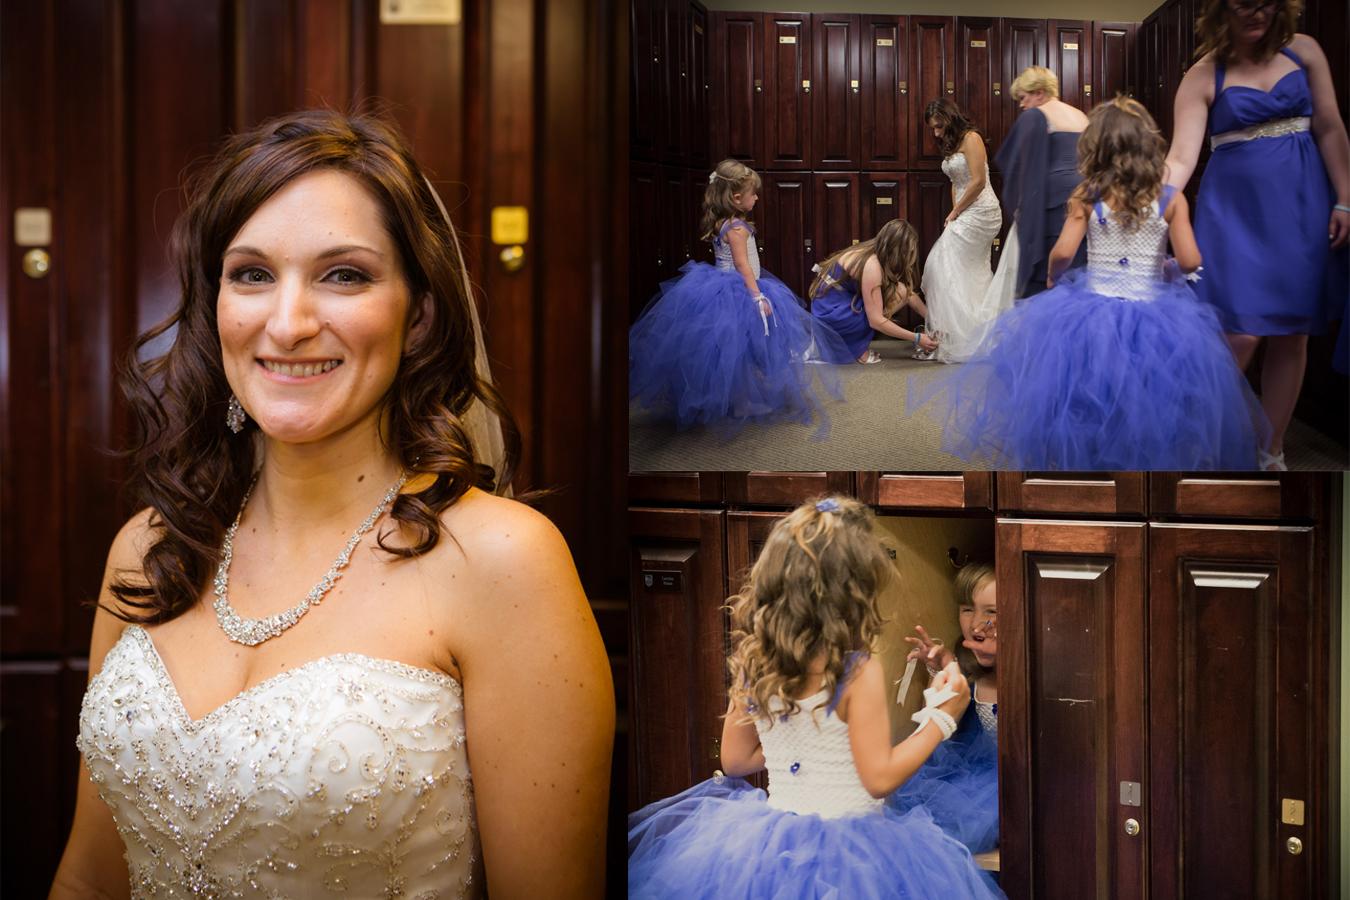 NEPA_Pocono_Weddings_Rob_Lettieri_Photography_02.jpg